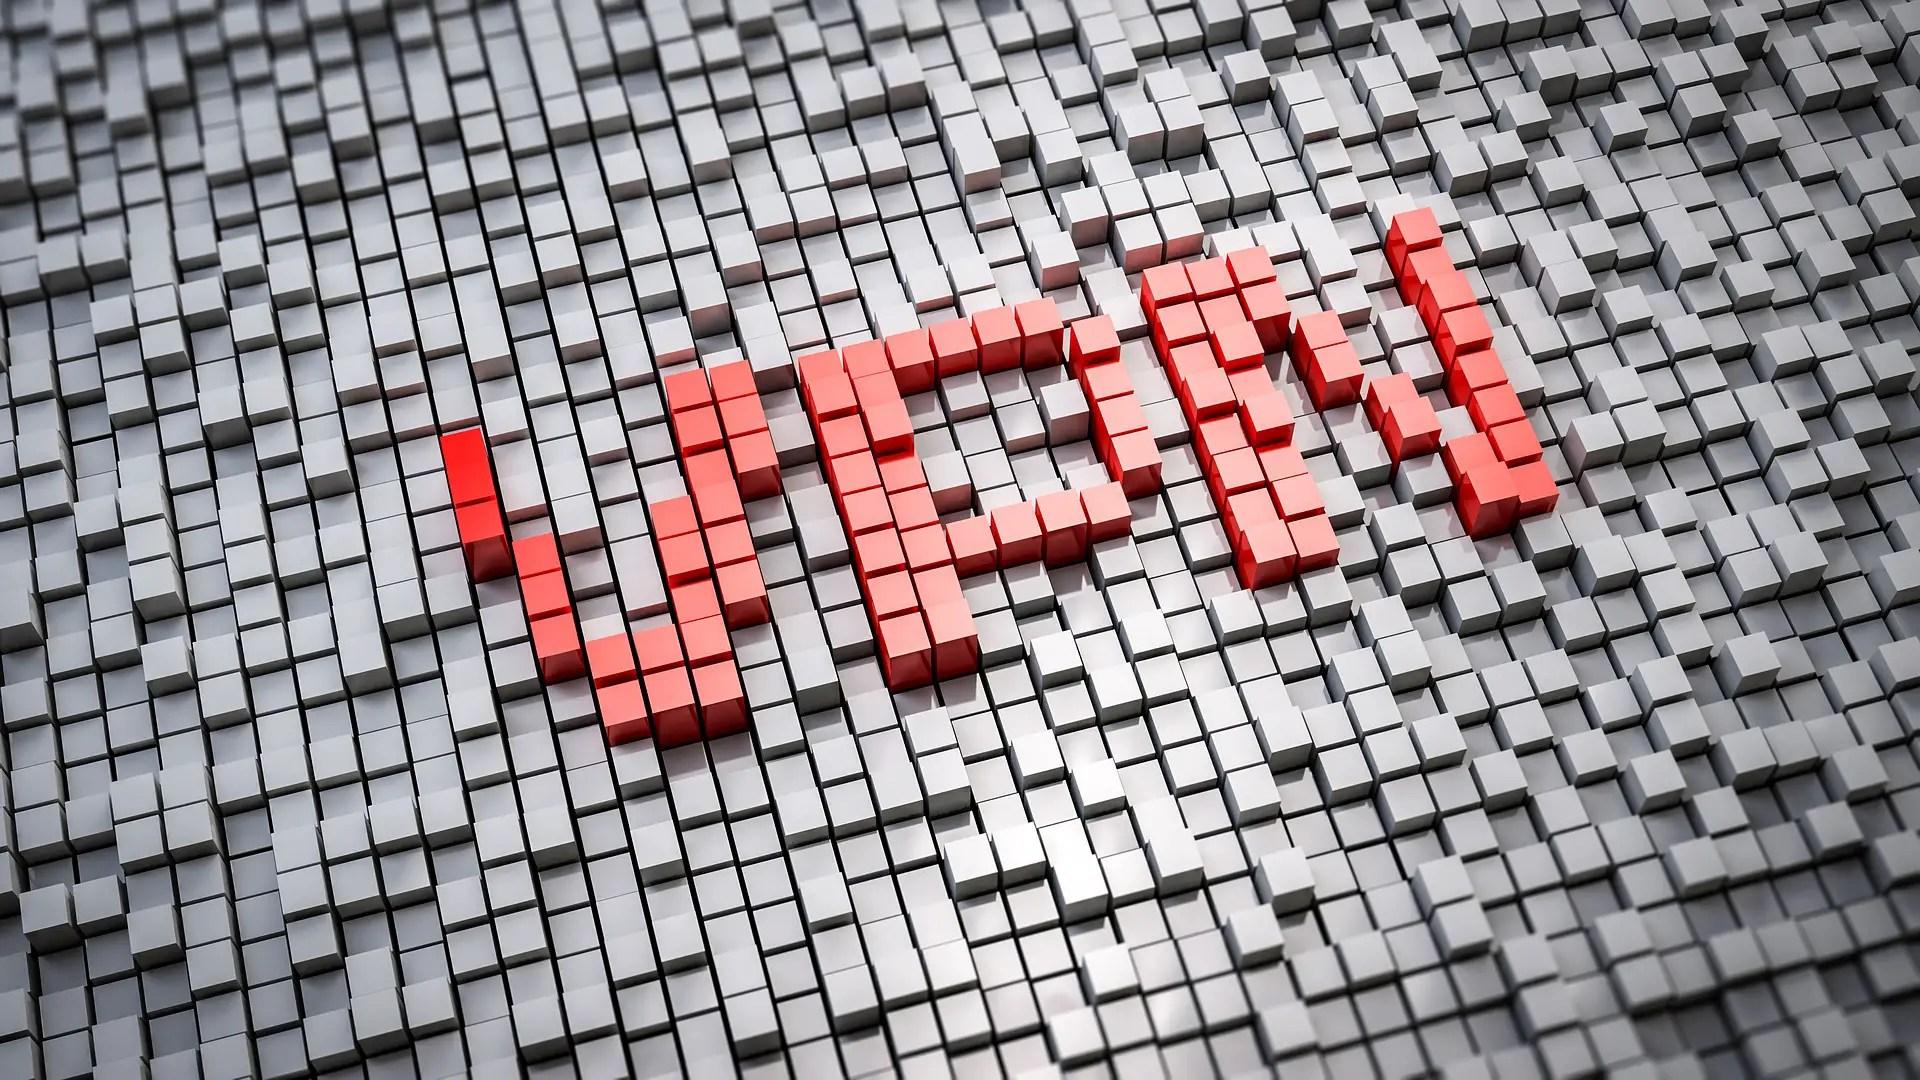 Free VPN for China: 5 Best VPNs for 2019